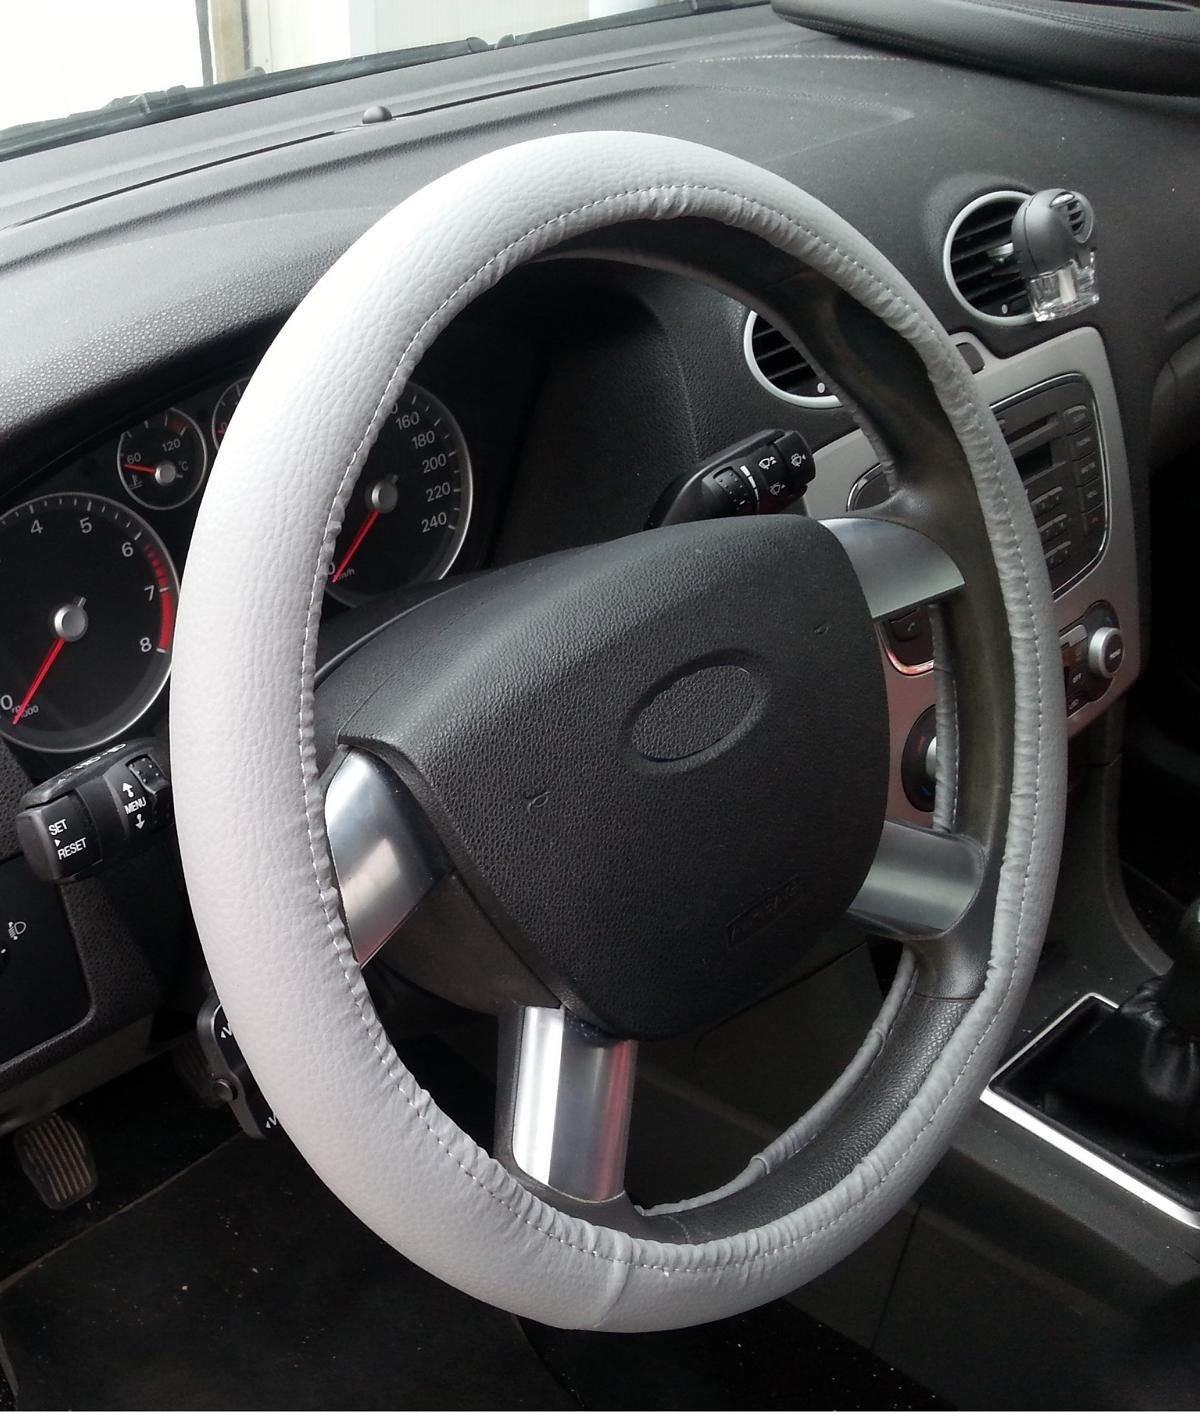 Renault Clio Black Genuine Leather Steering Wheel Cover Glove 37cm